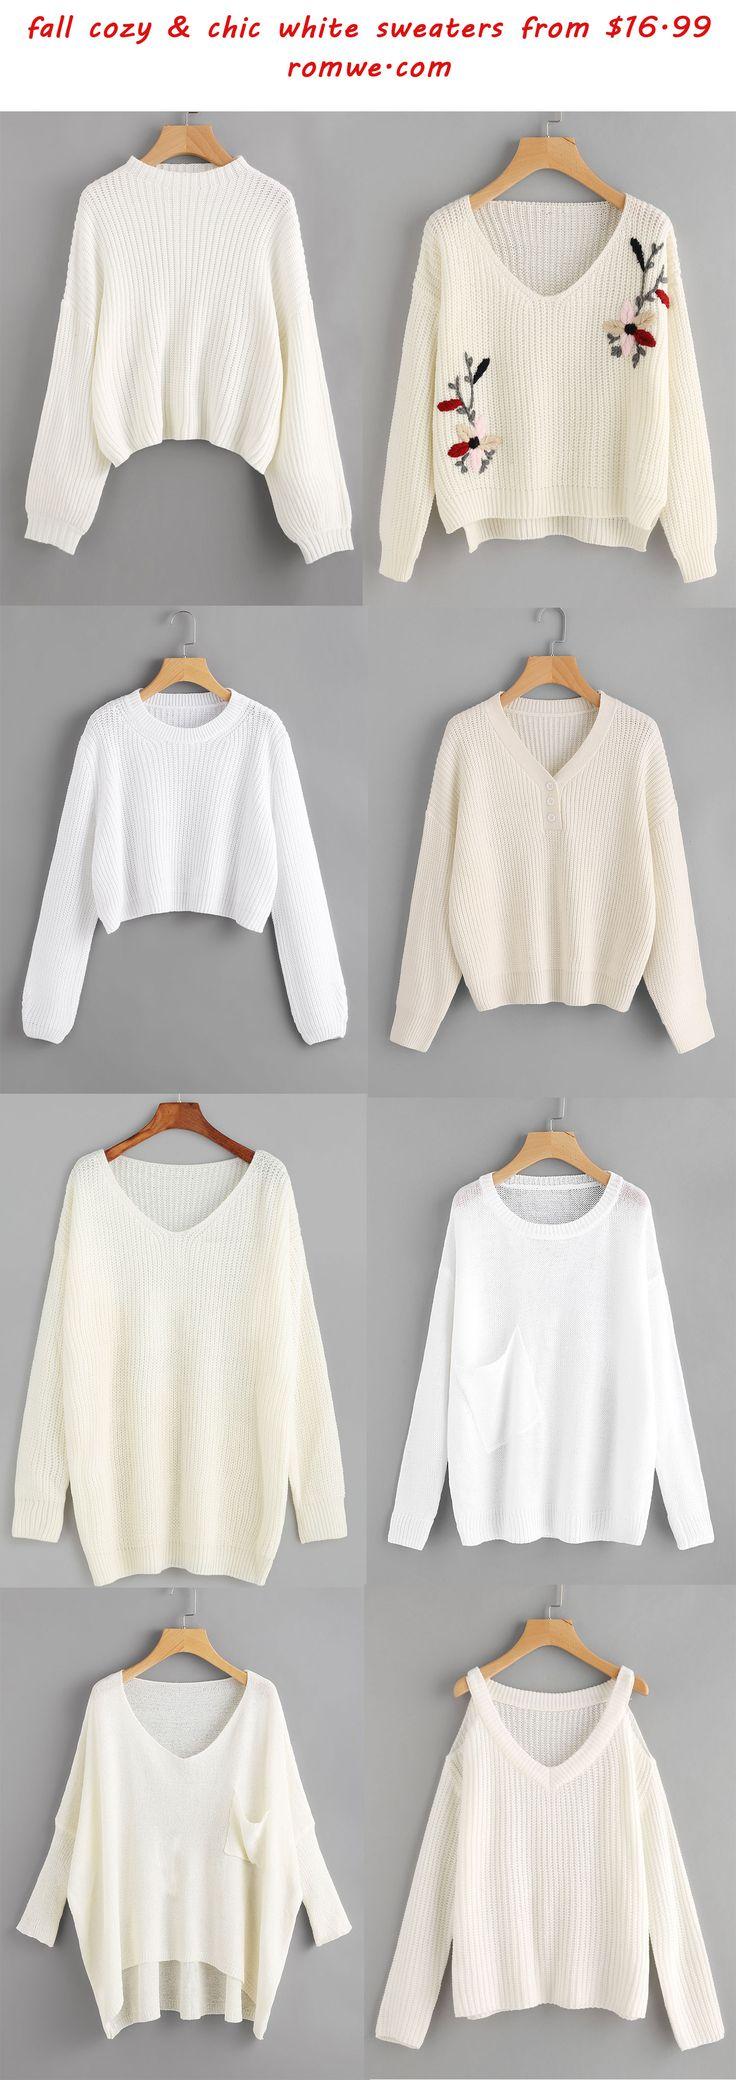 Best 25  White sweaters ideas on Pinterest | White knit sweater ...